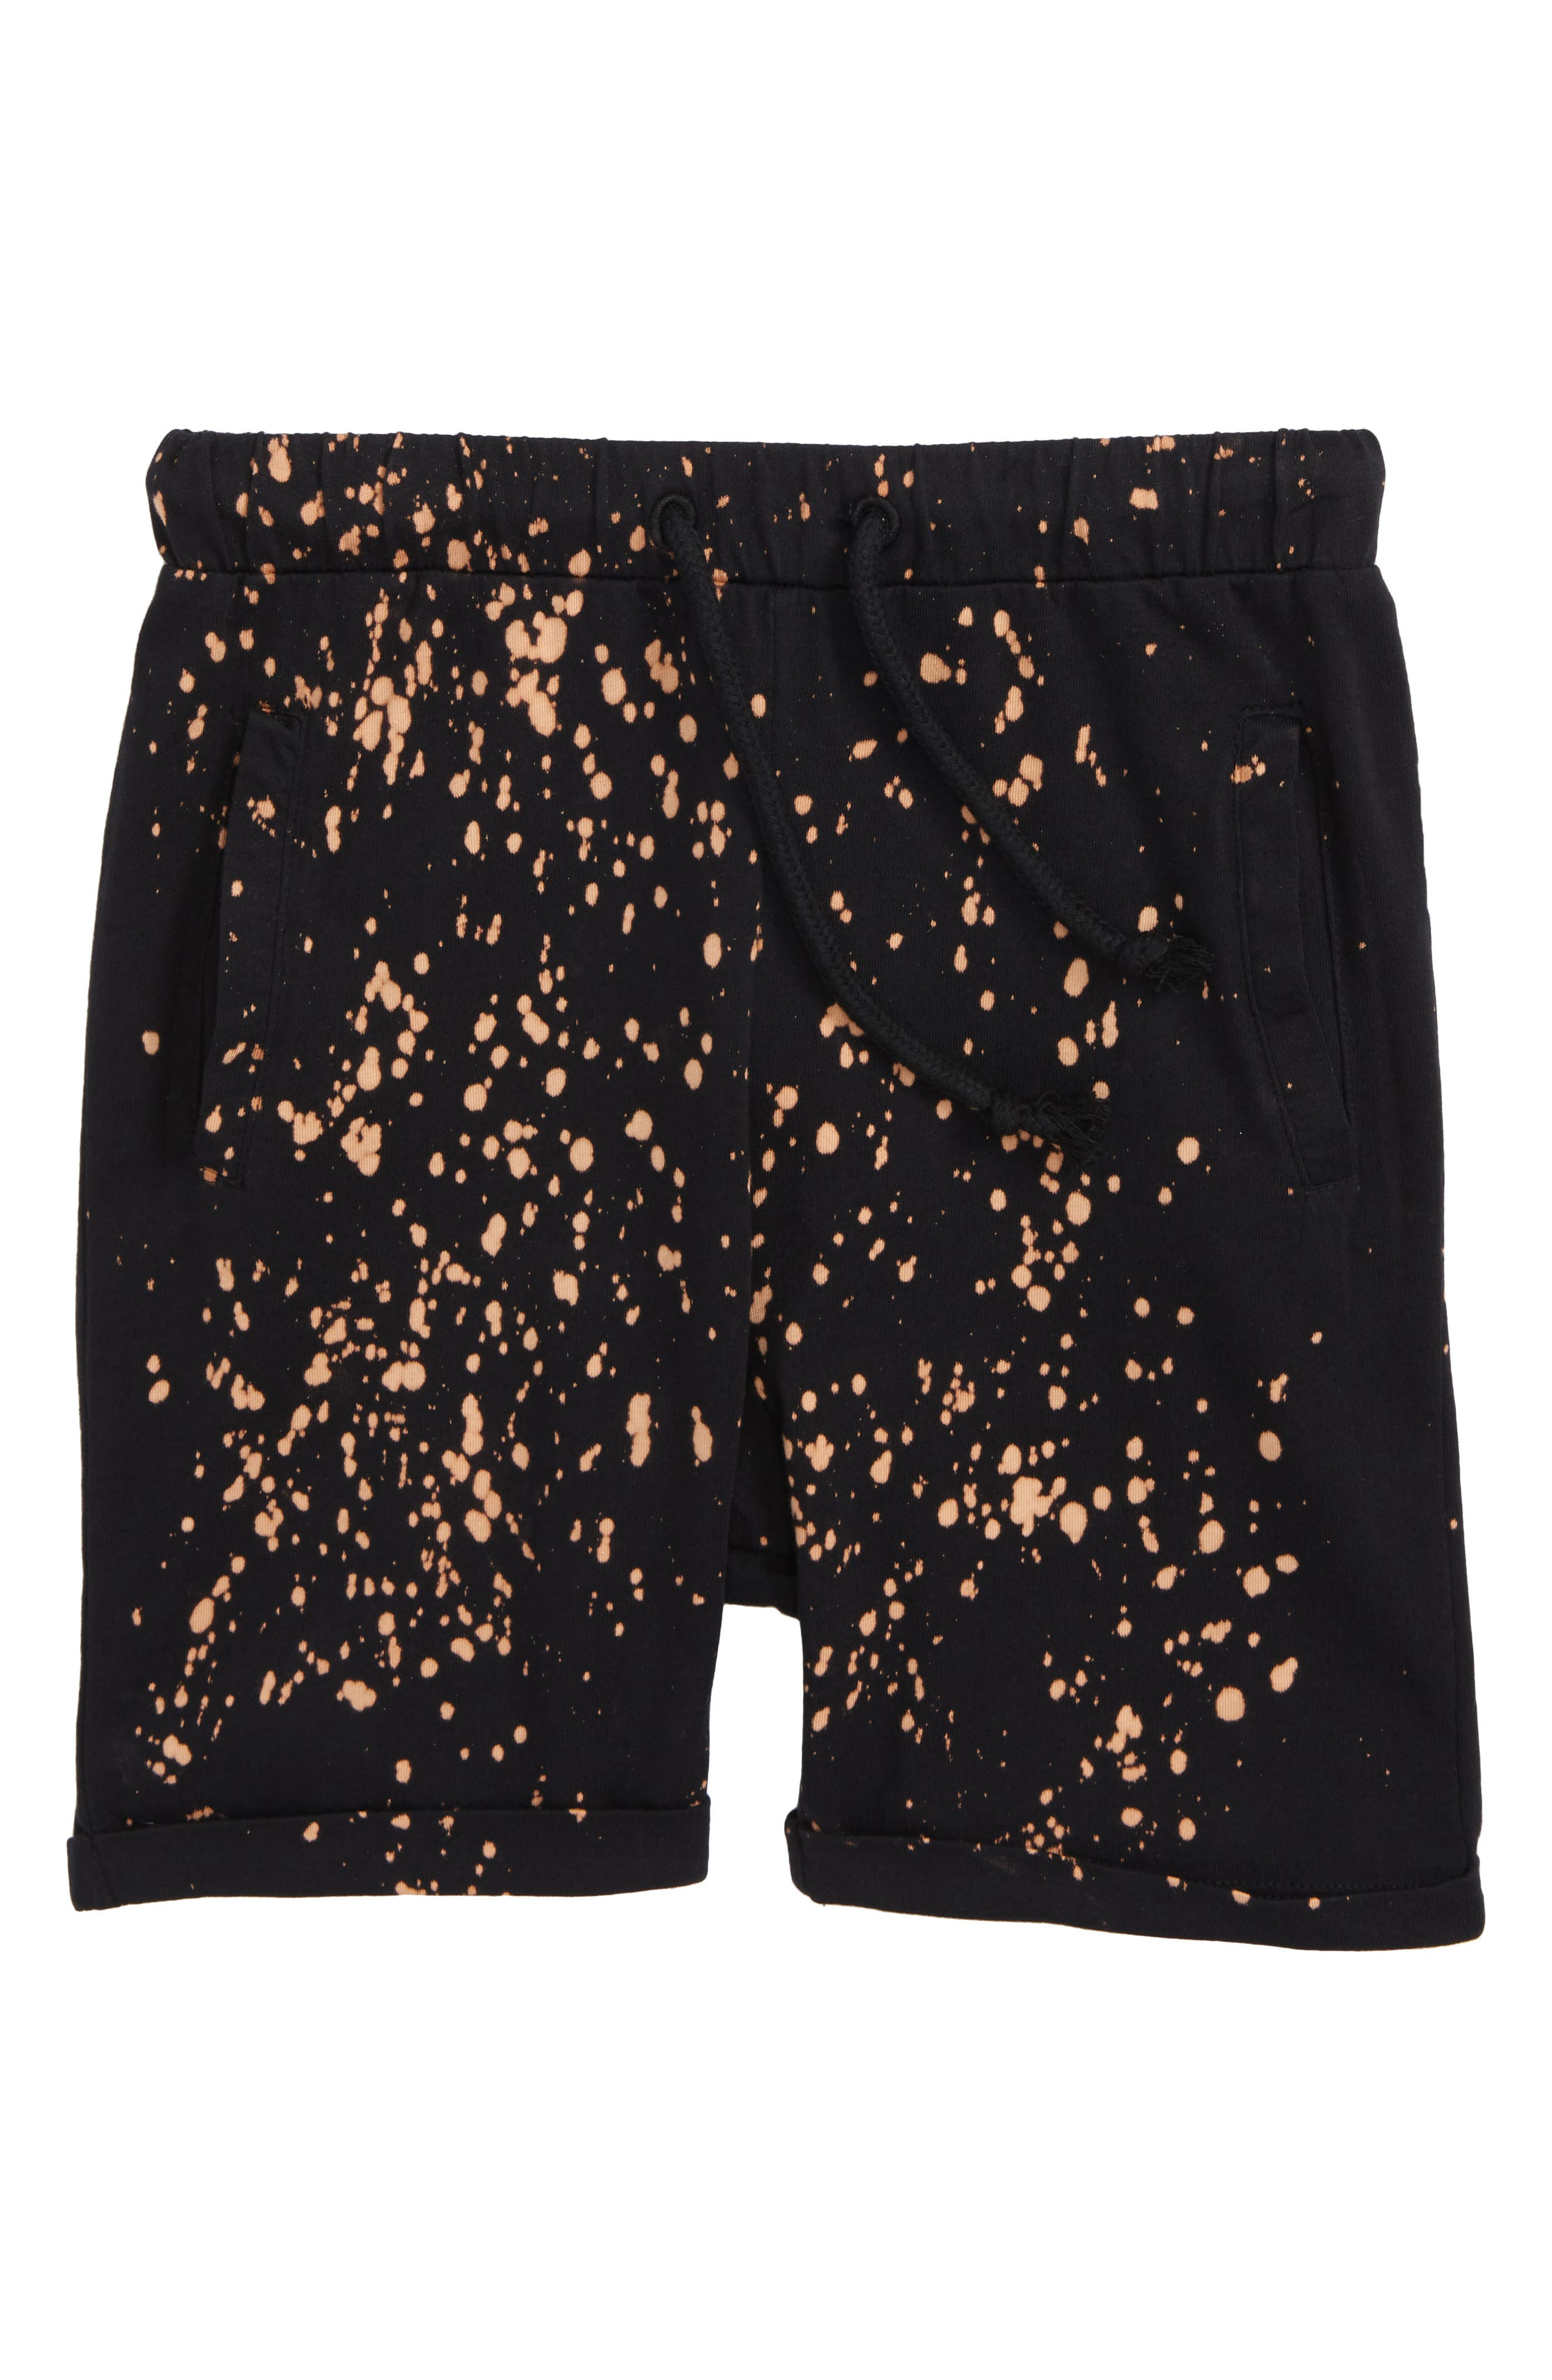 Avalon Knit Shorts,                             Main thumbnail 1, color,                             001